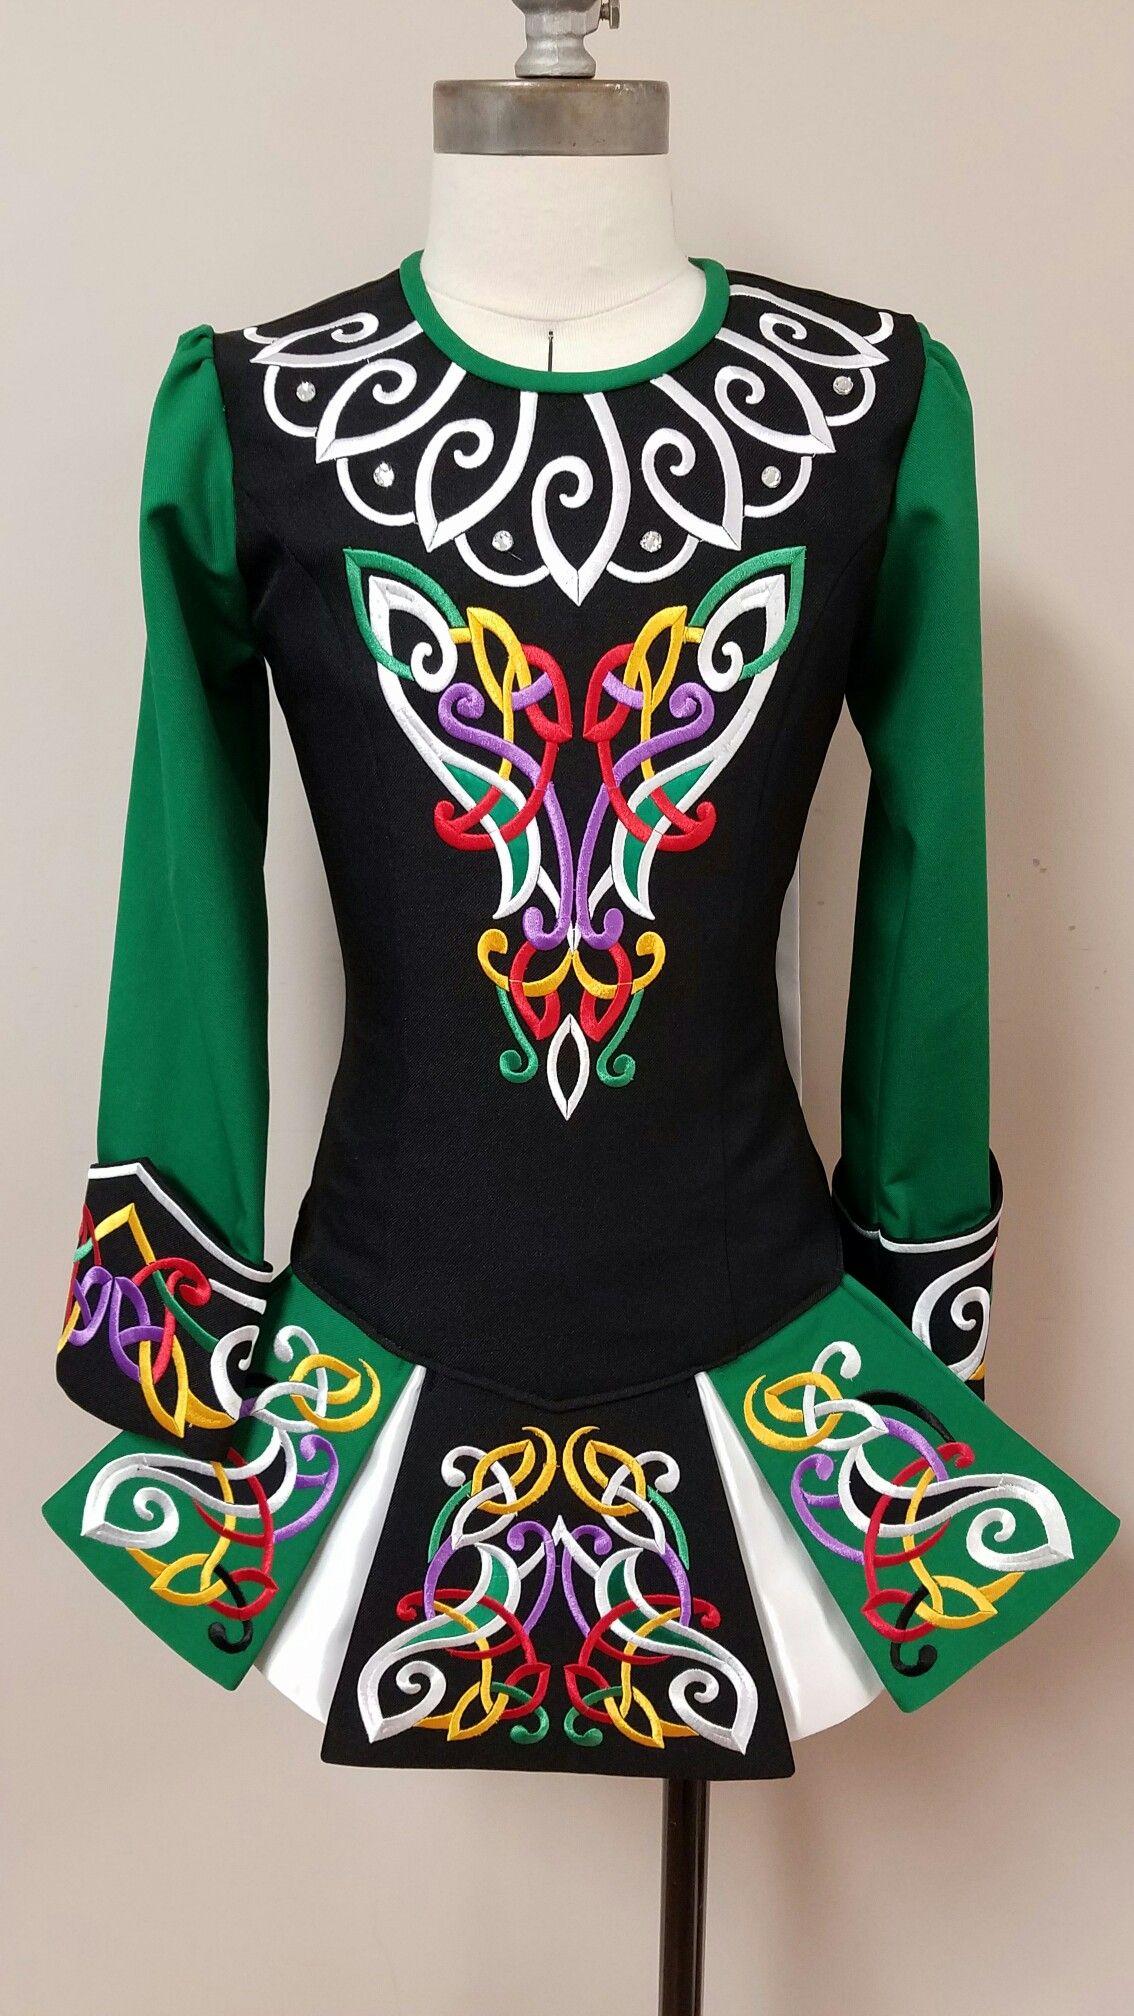 Irish Dance Team Dress Irish Dance School Dress By Prime Dress Designs Rince Na Tiarna Irish Dancing Dresses Irish Dance Costume Solo Dress